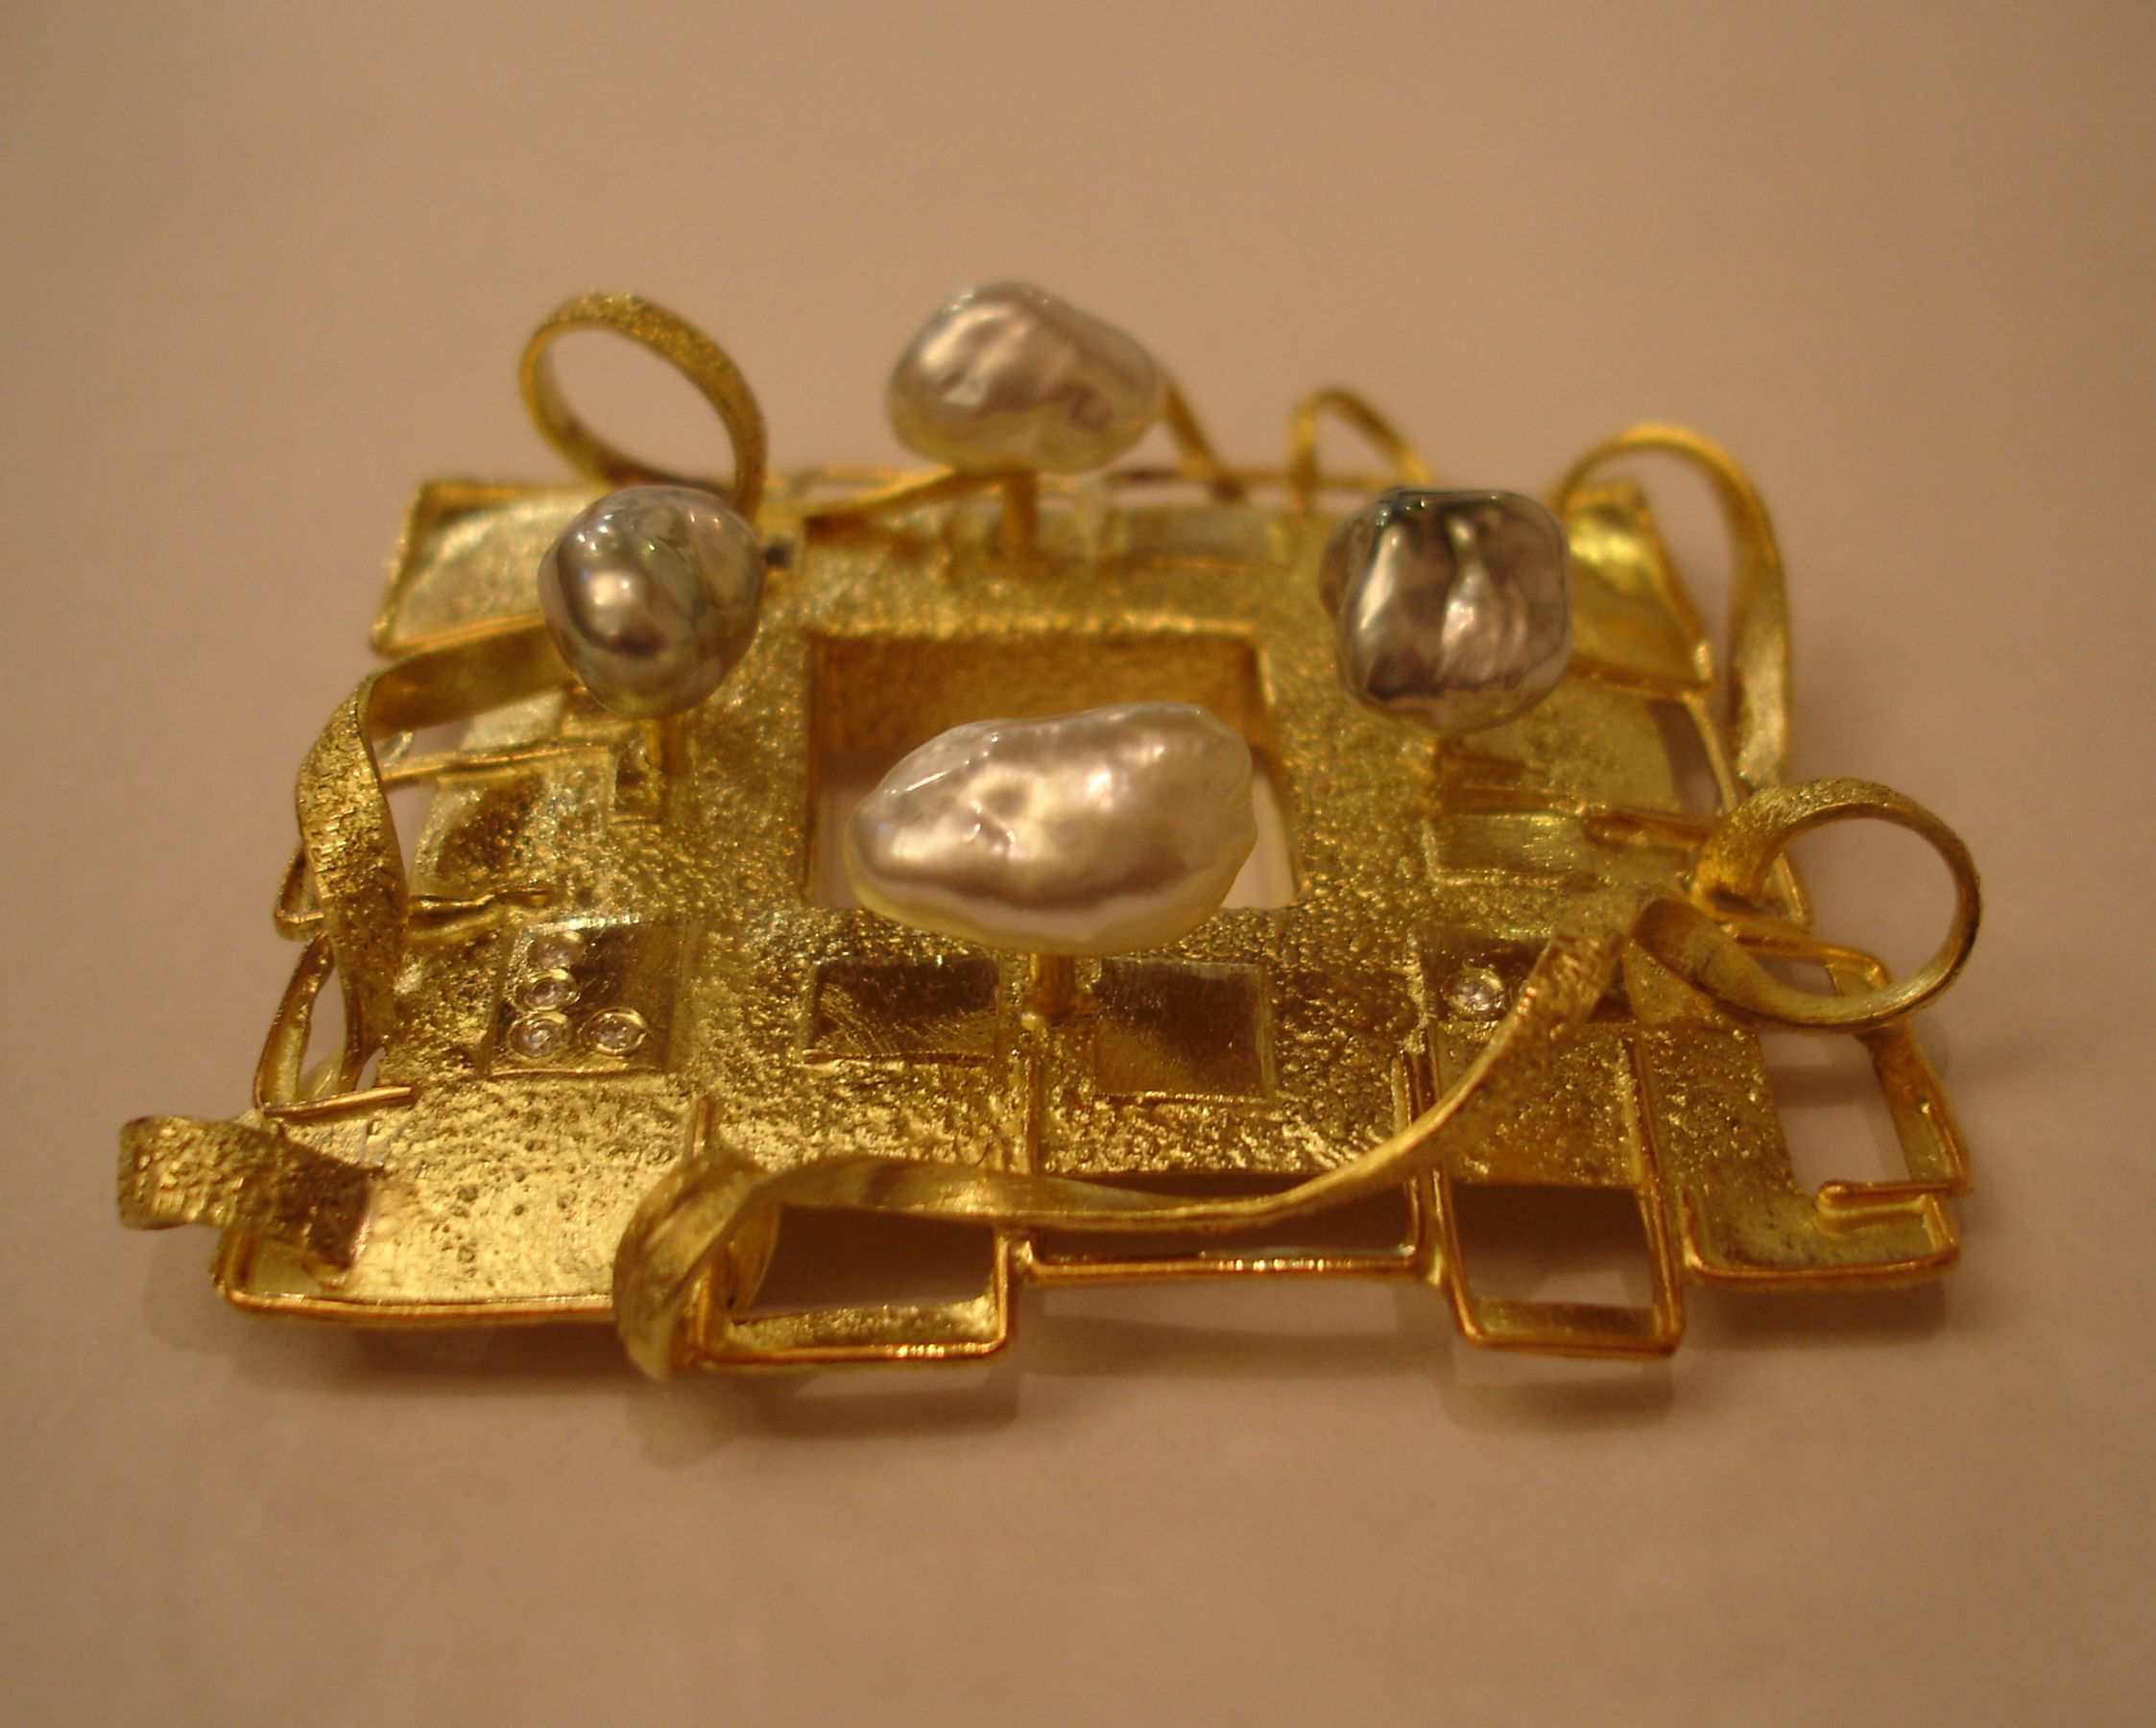 brooch parls gold an diamonds veronaforever marcoborghesi